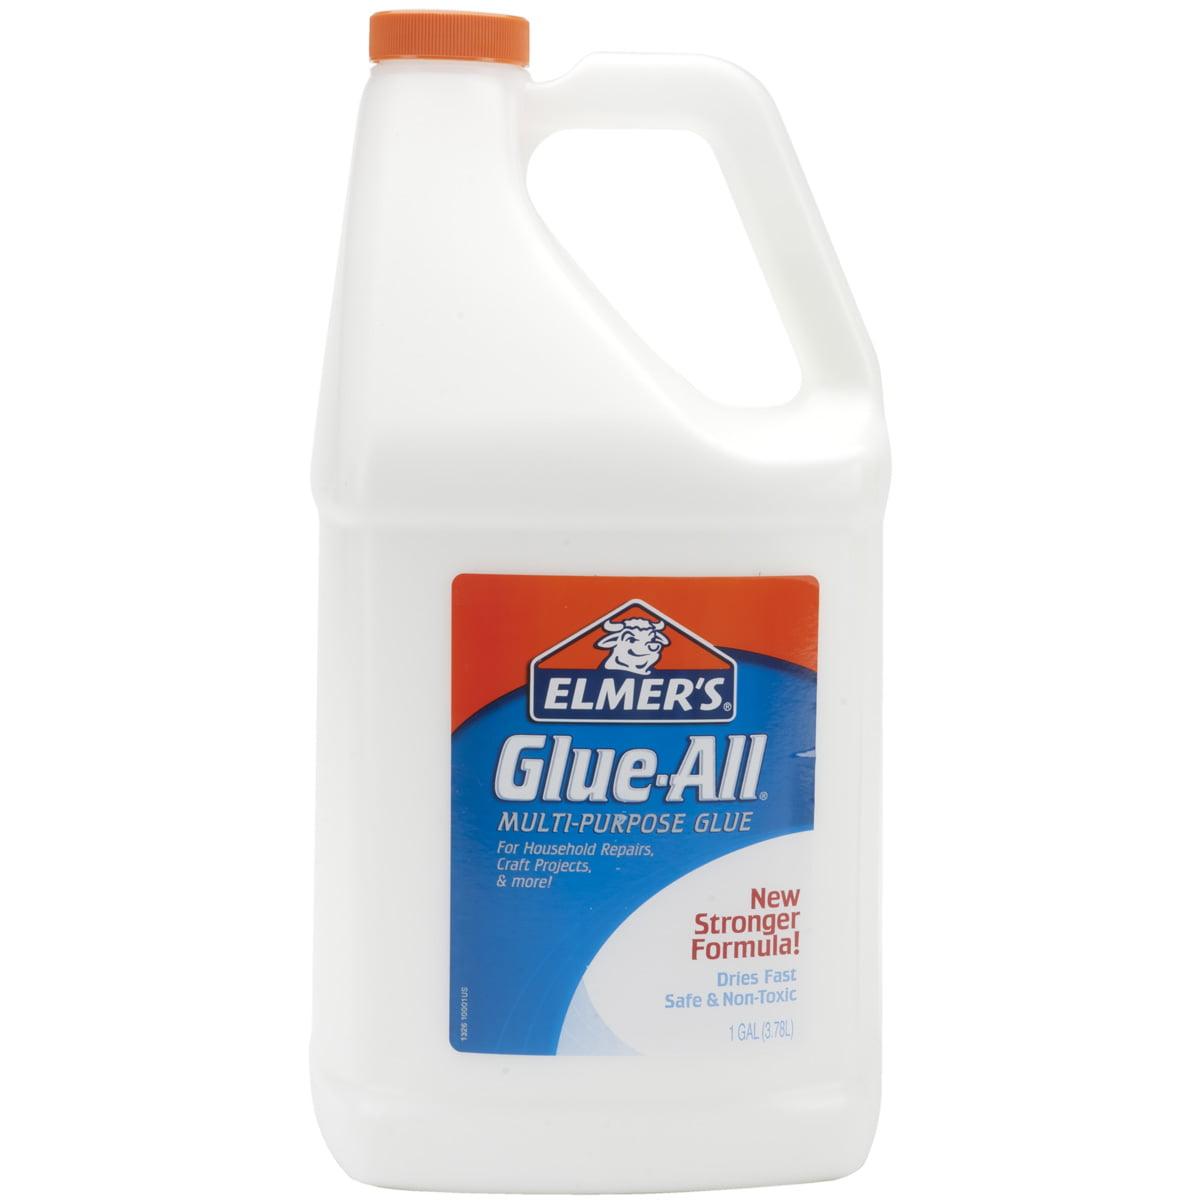 Elmers Glue-All Multipurpose Glue, Gallon by Elmers/X-Acto